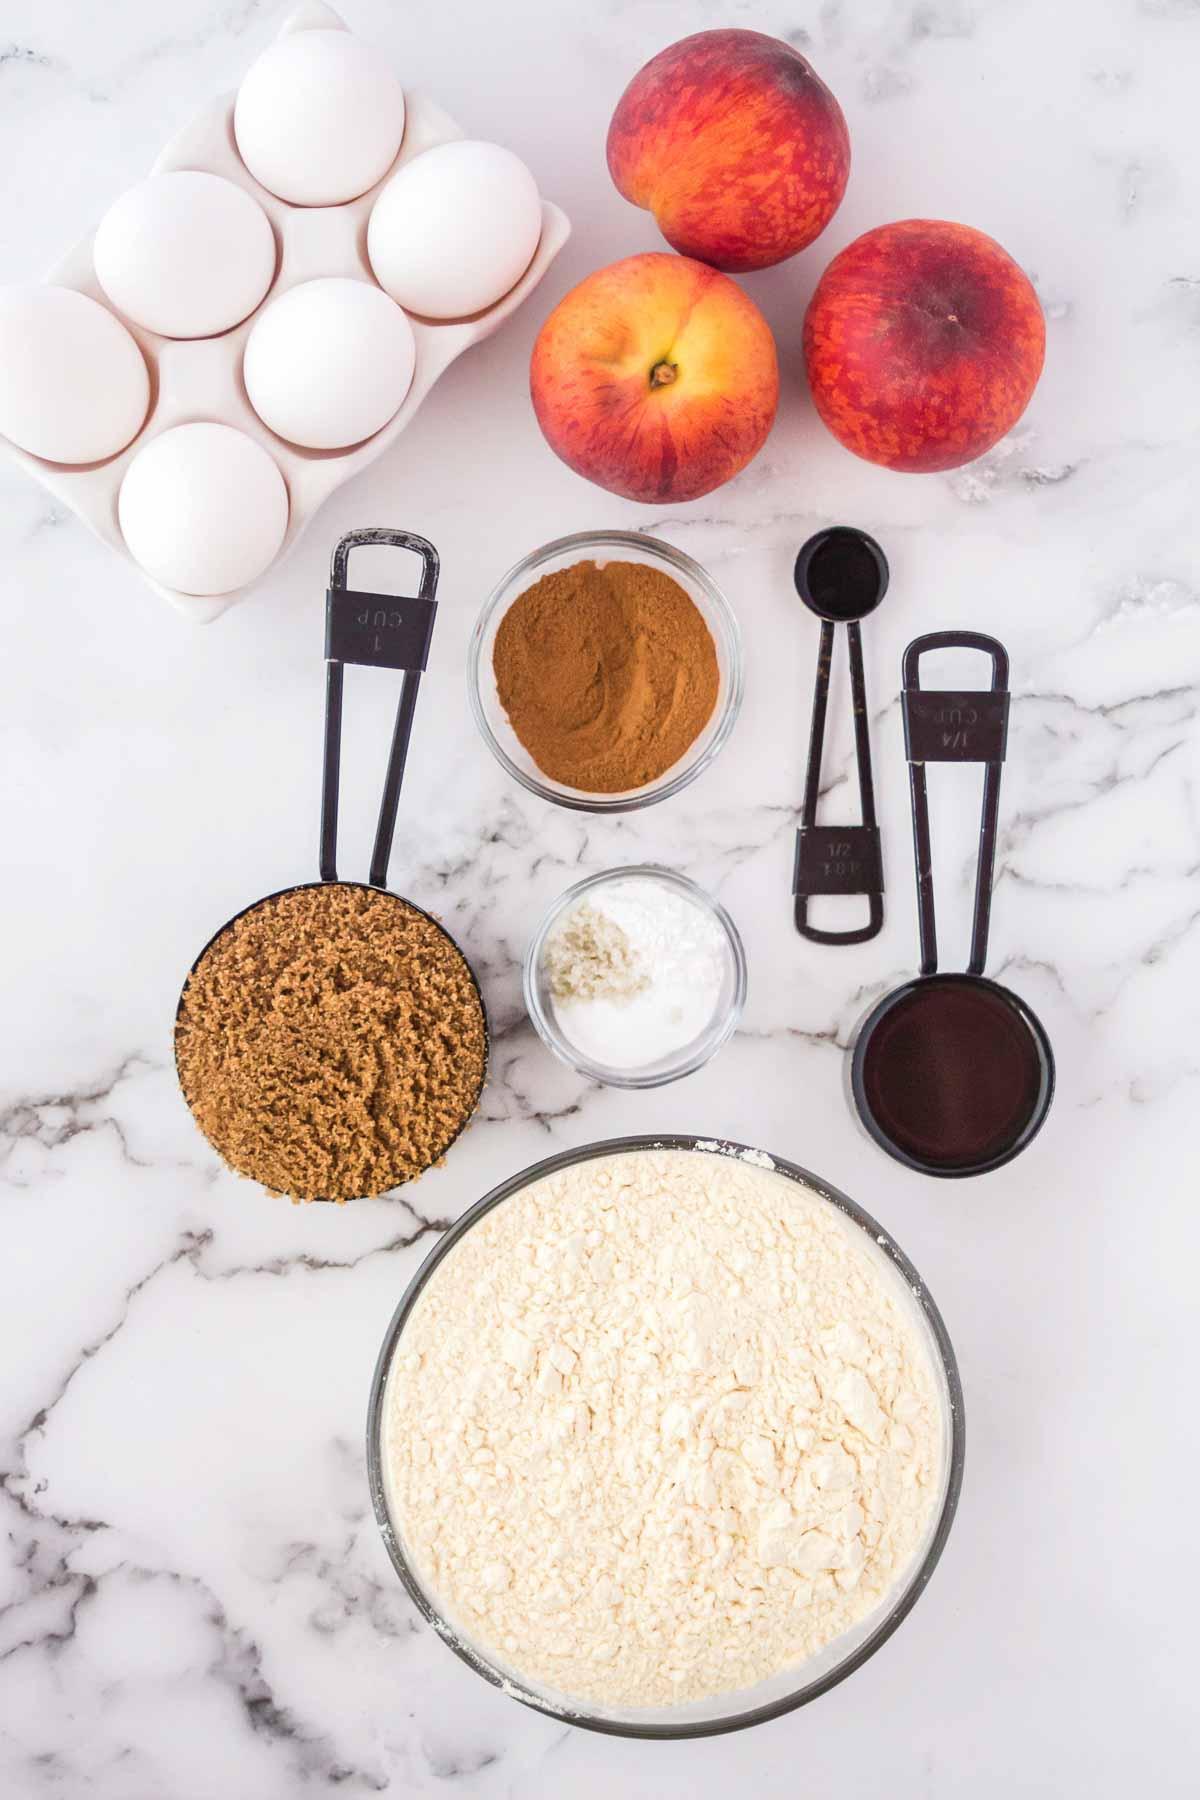 Ingredients to bake peach bread.